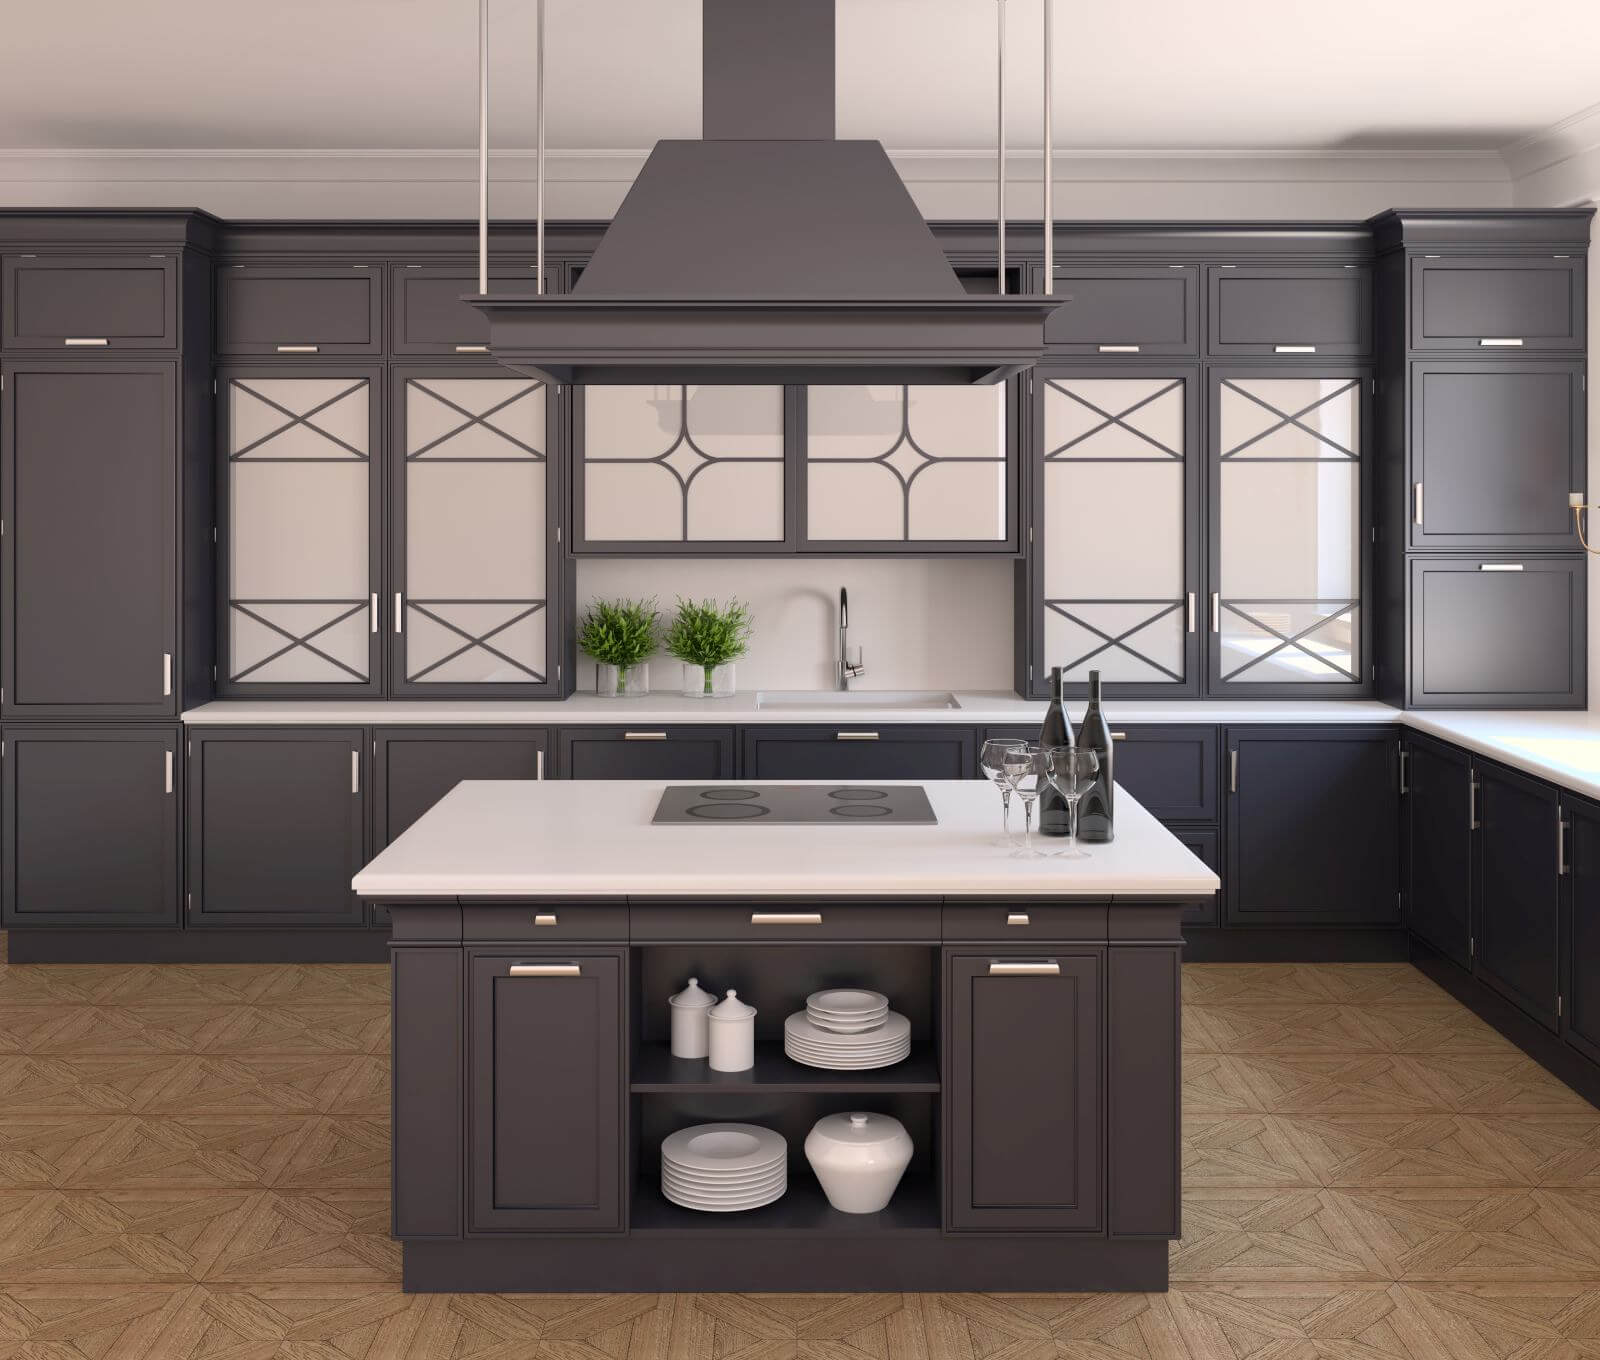 Interior of classic black kitchen. 3d render.